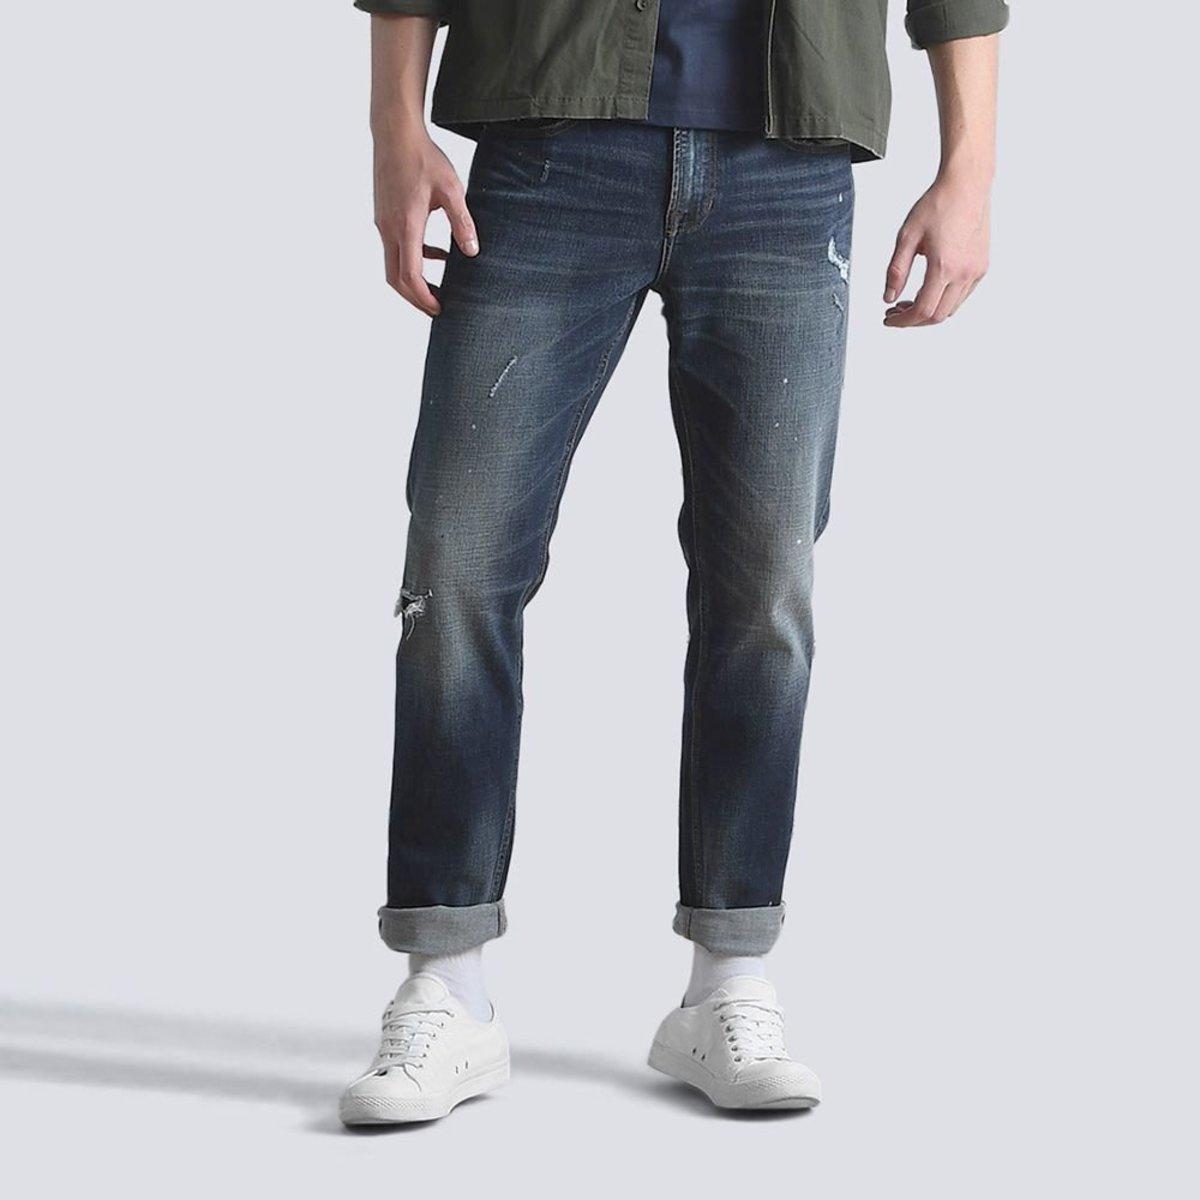 Men's Straight Paint Splatter Wash Jeans